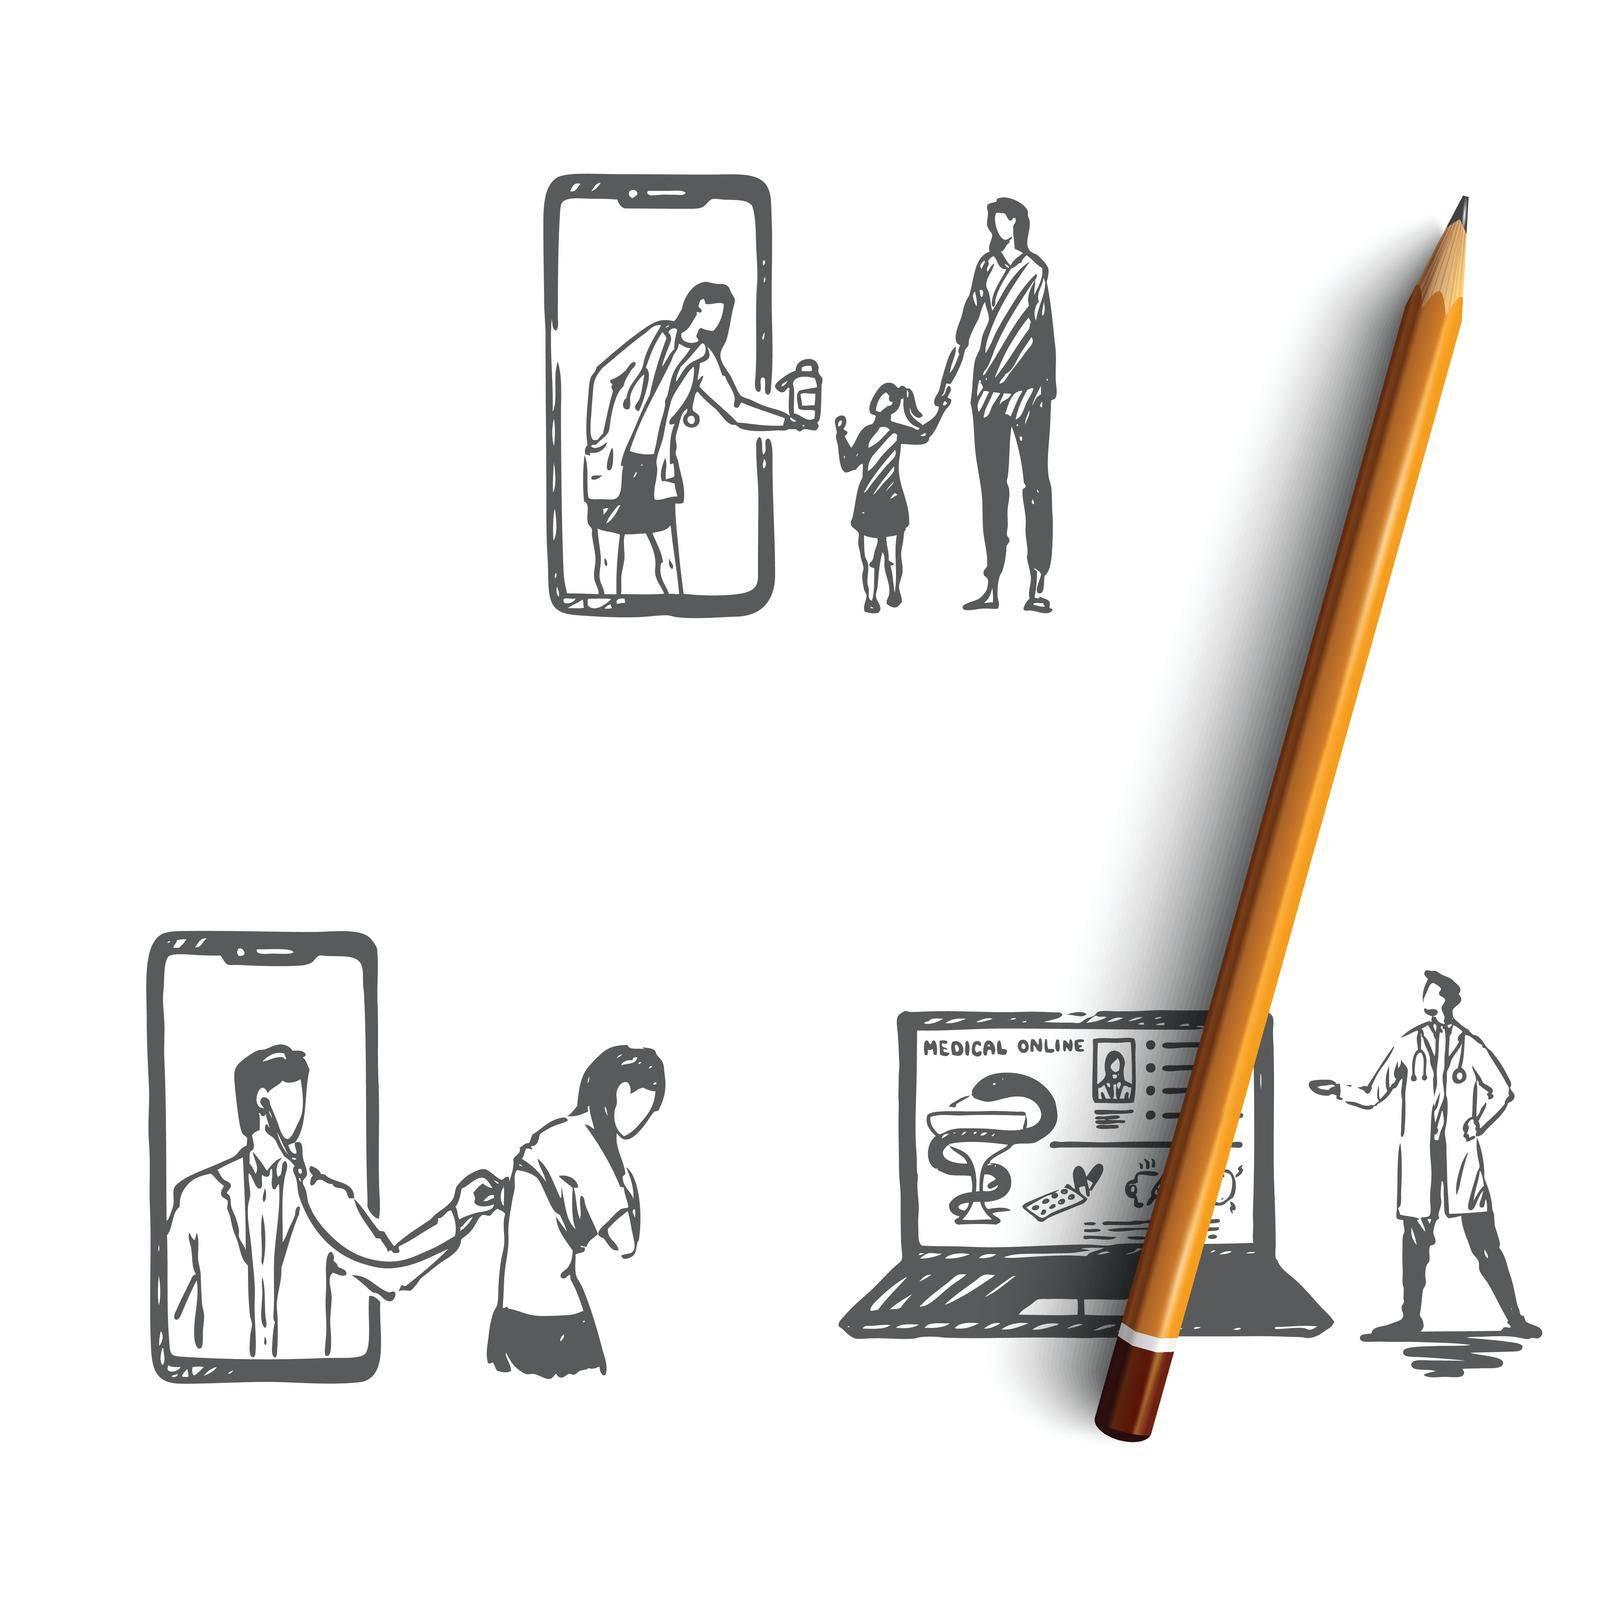 Online medicine - people ordering medicine, having medical examination and reading medical literature from laptop or smartphone screen vector concept set by Vasilyeva